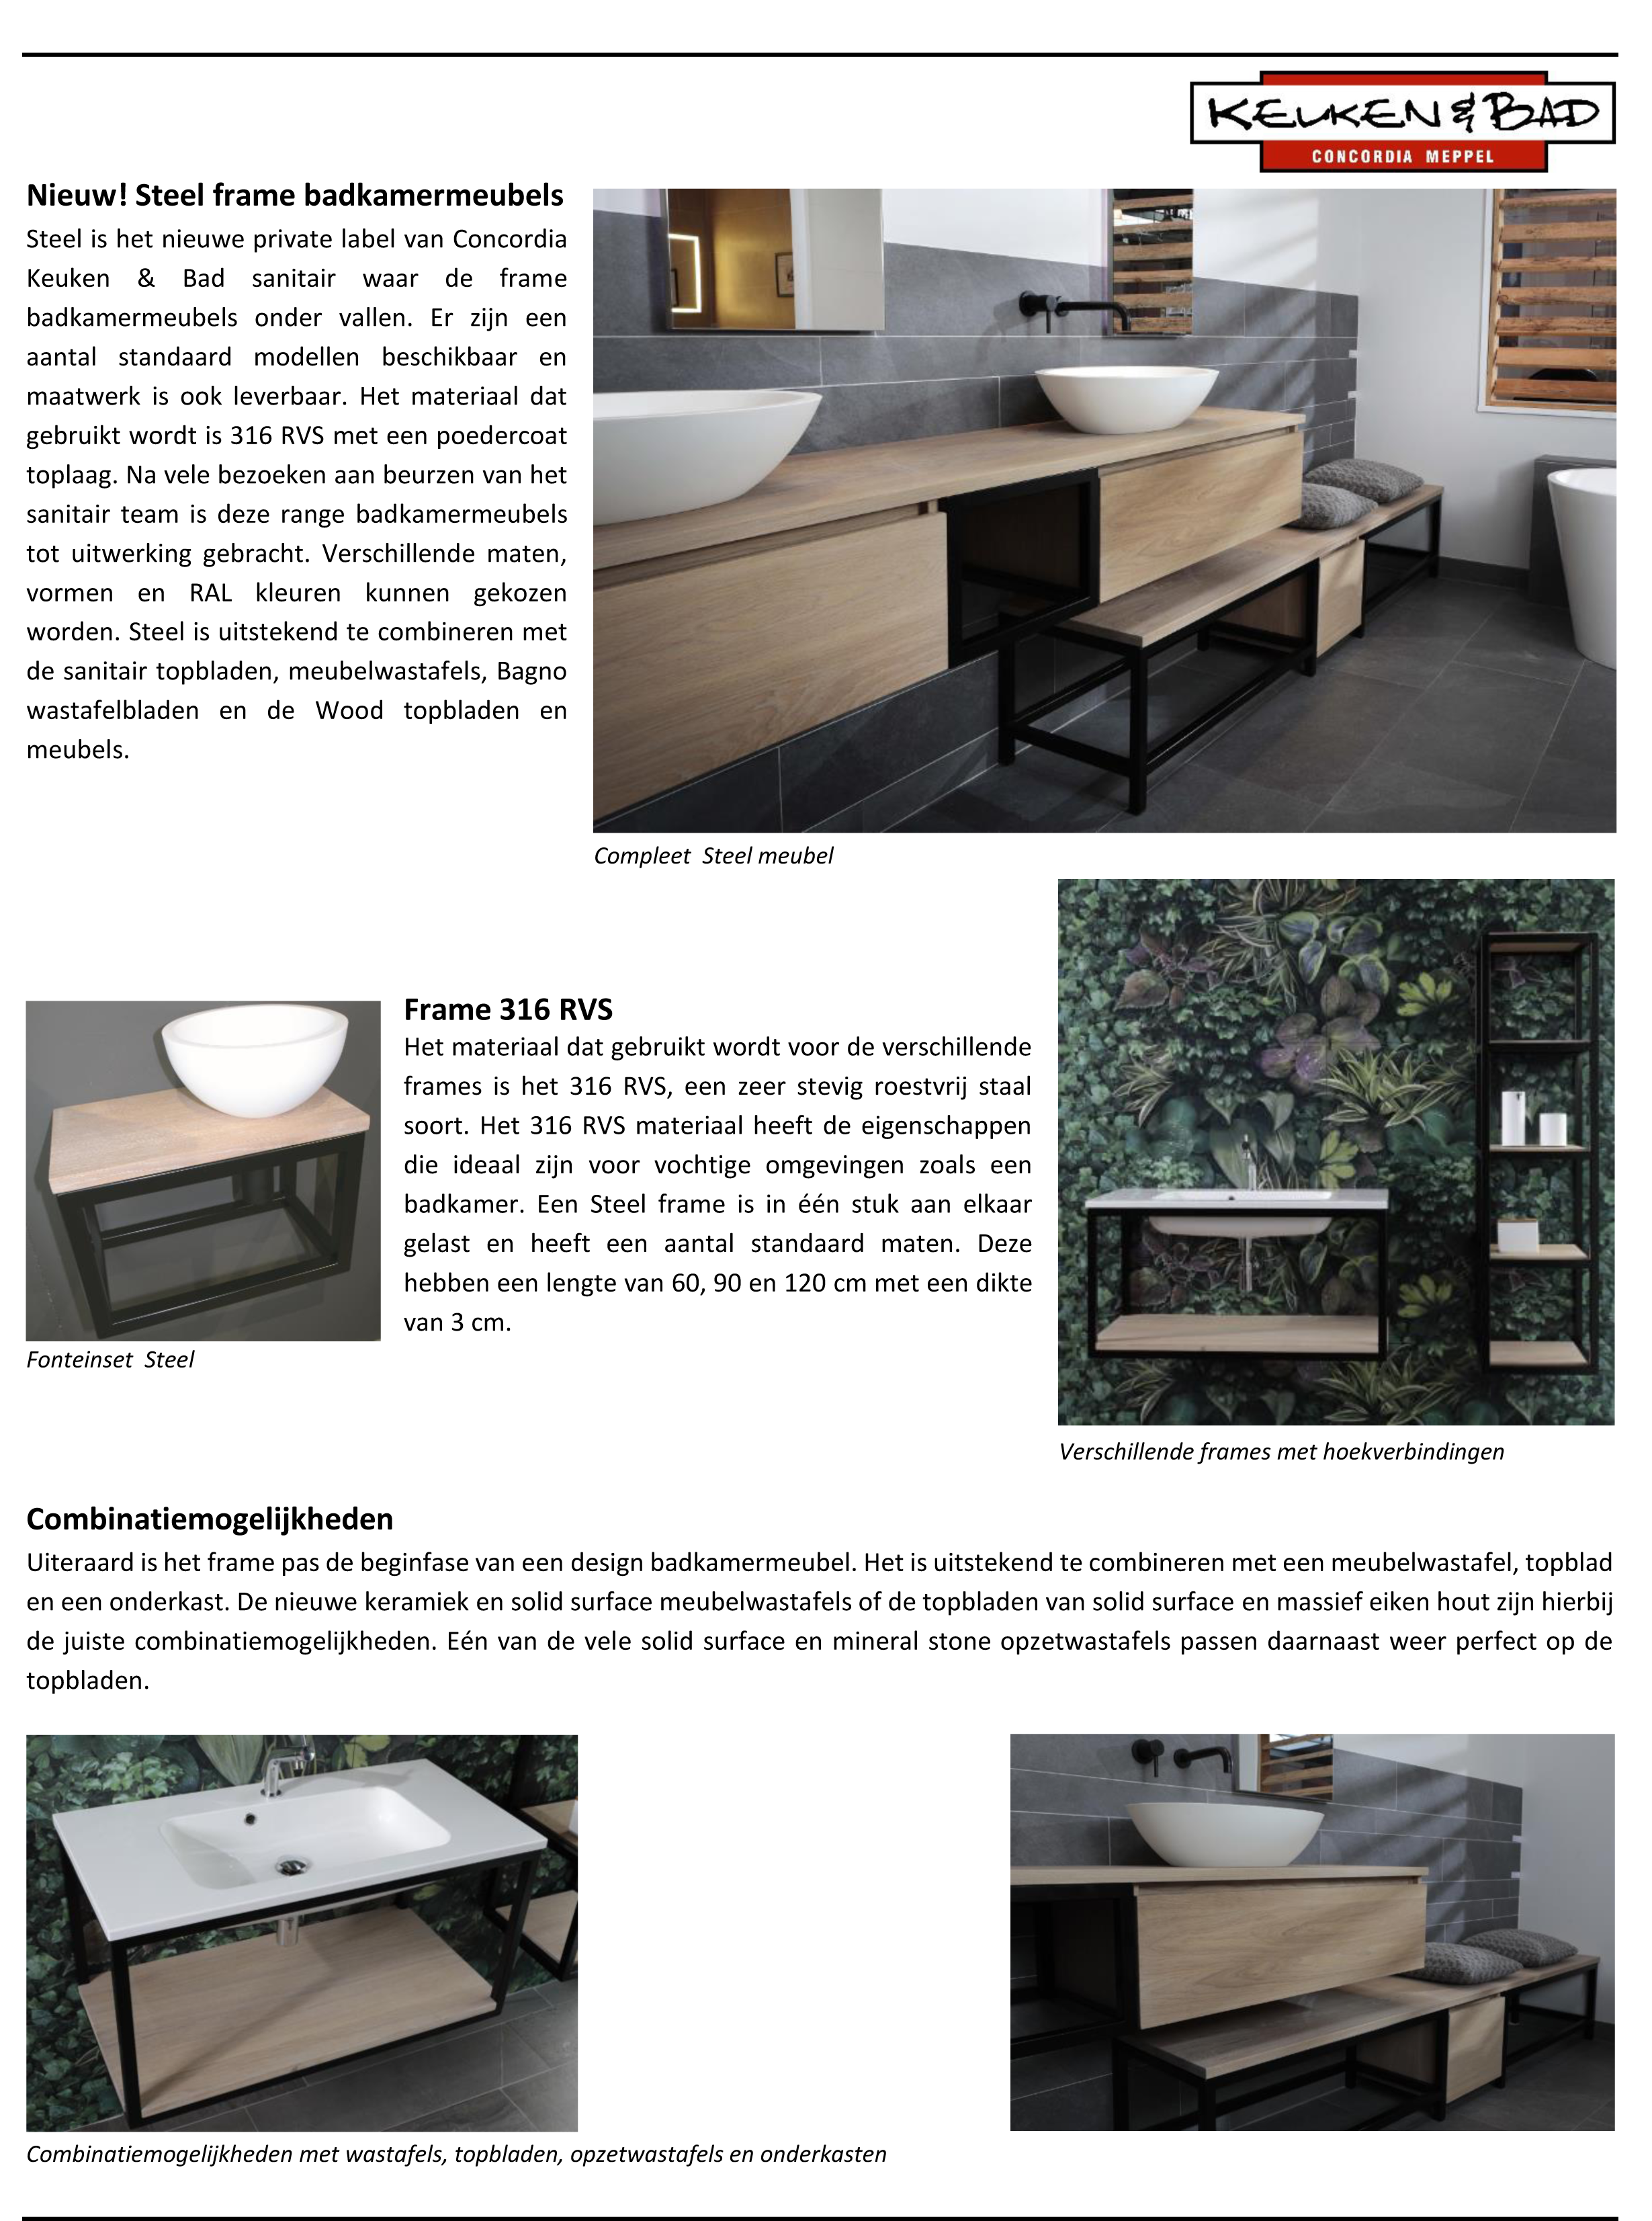 nieuw steel frame badkamermeubels bij concordiakenb sanitair